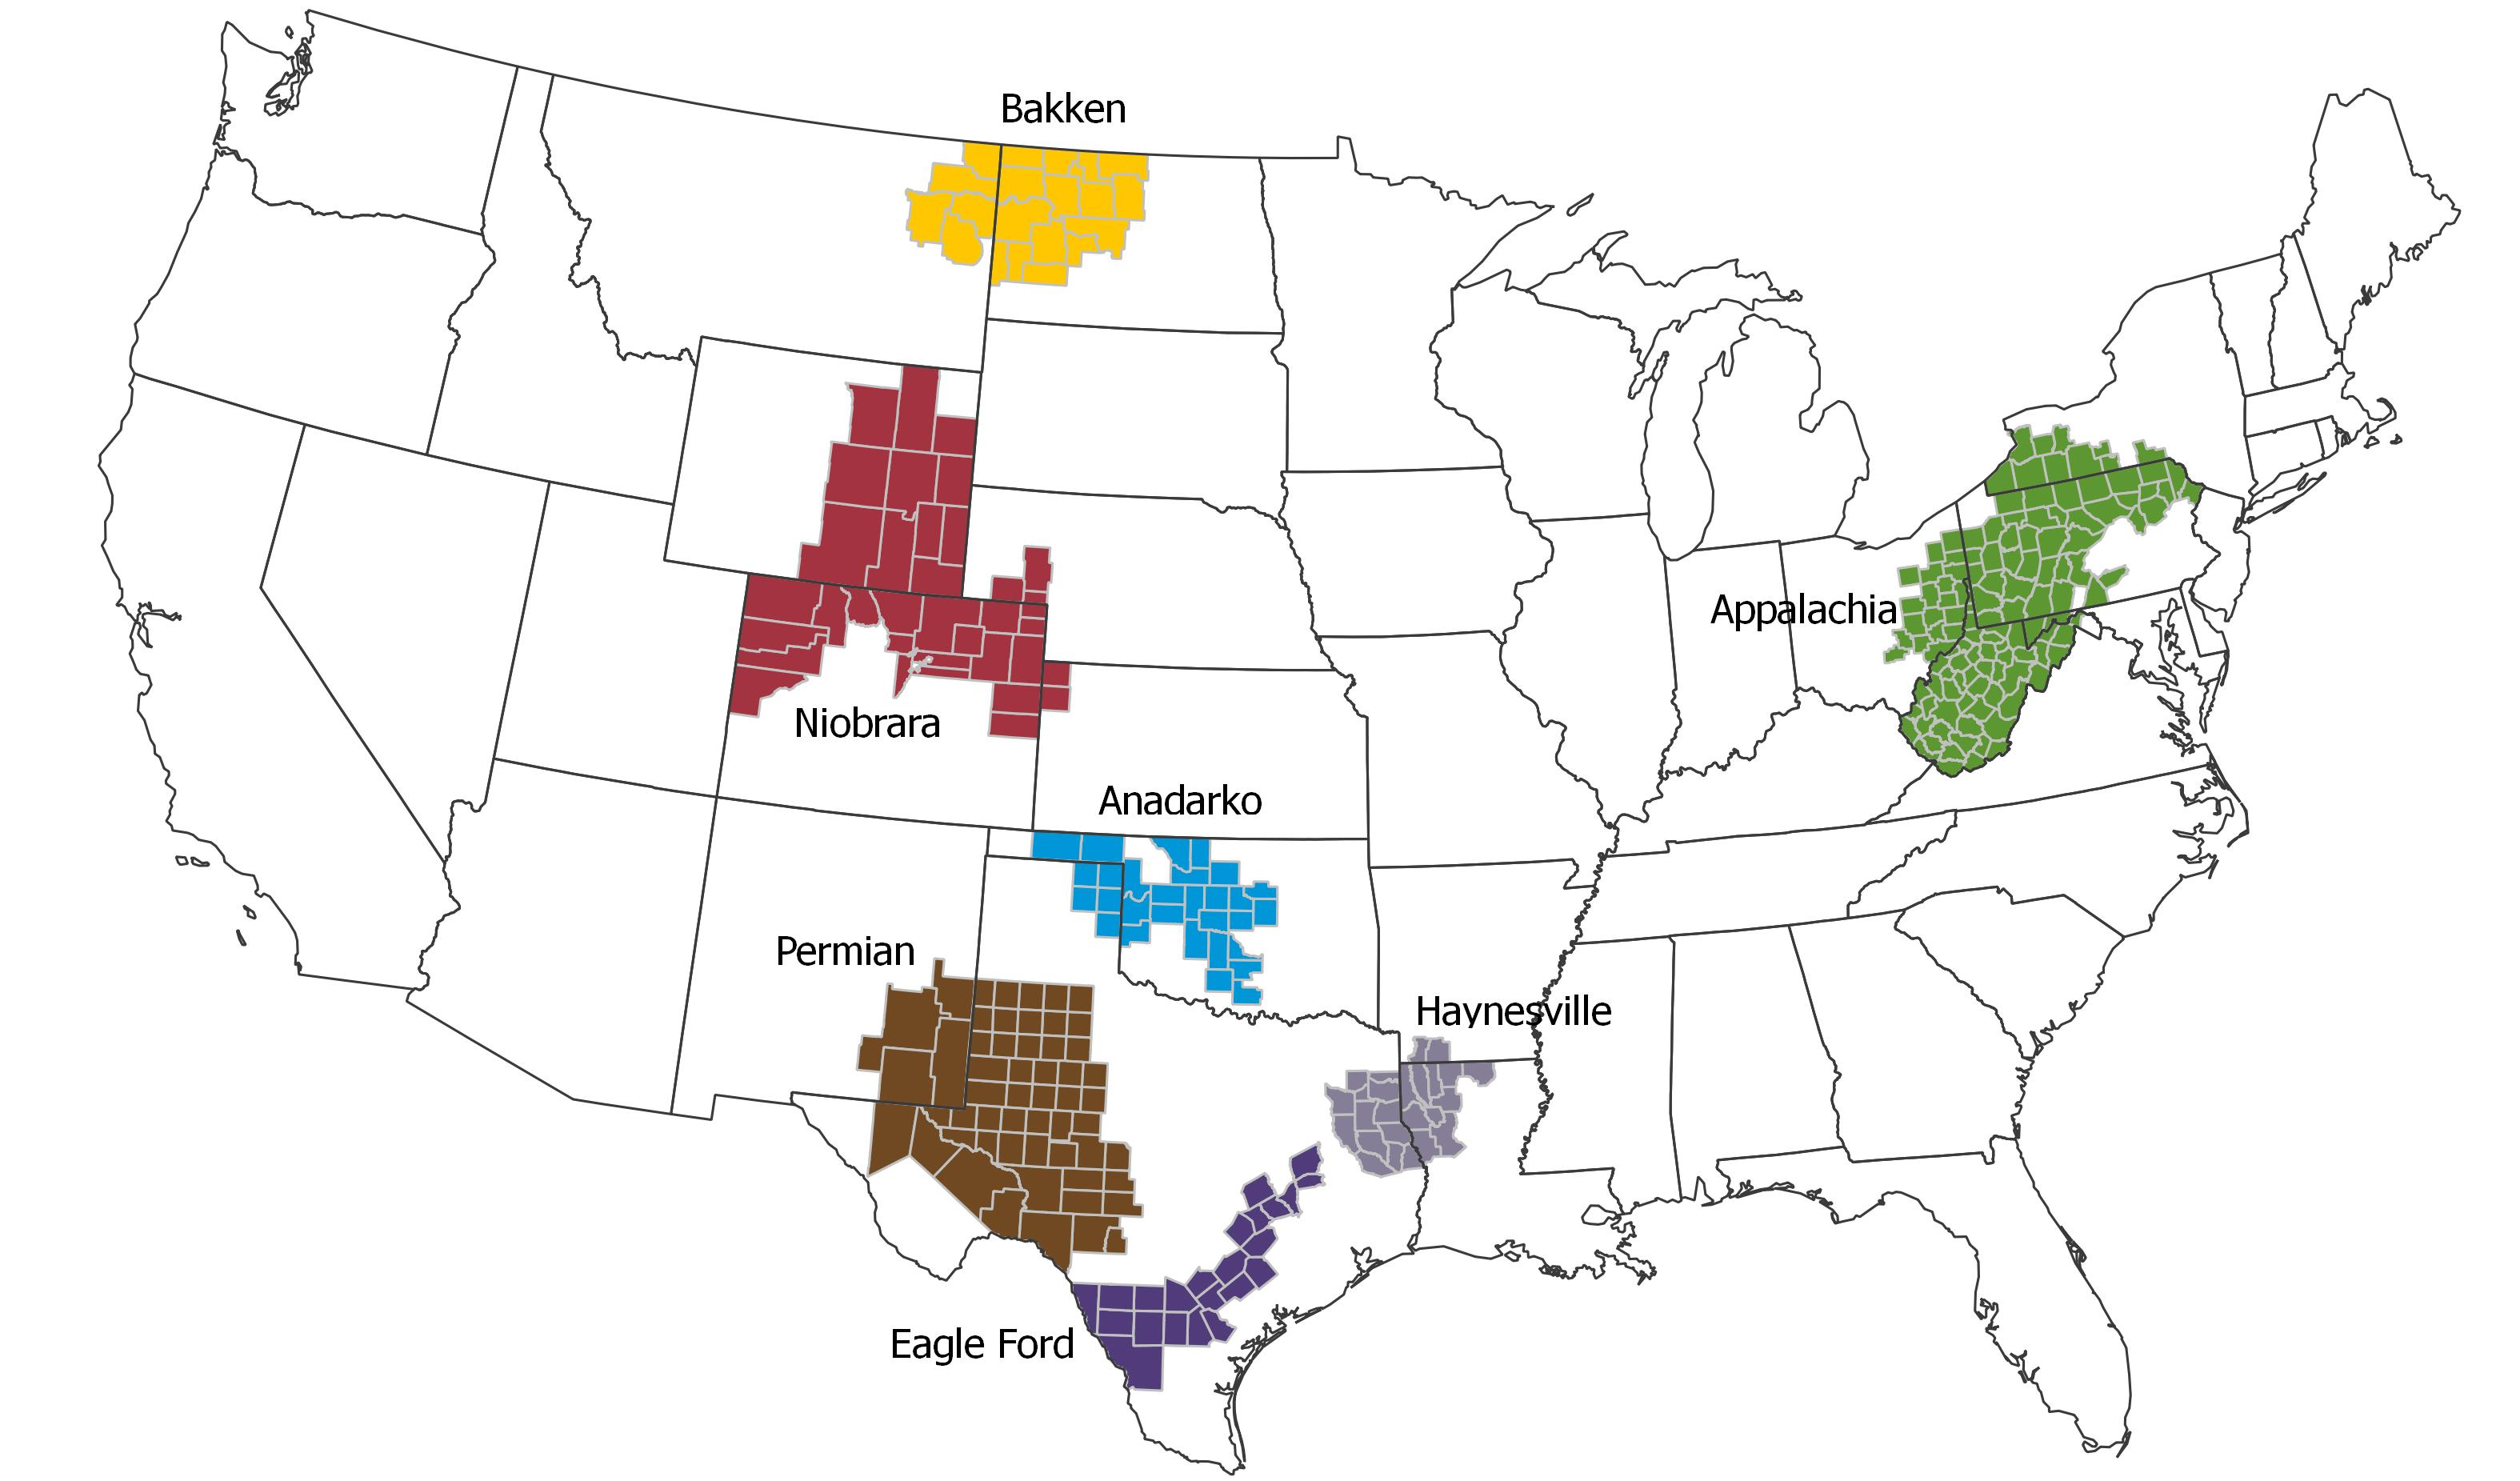 Brent-WTI Oil Spread Taking Cue From Houston-Midland